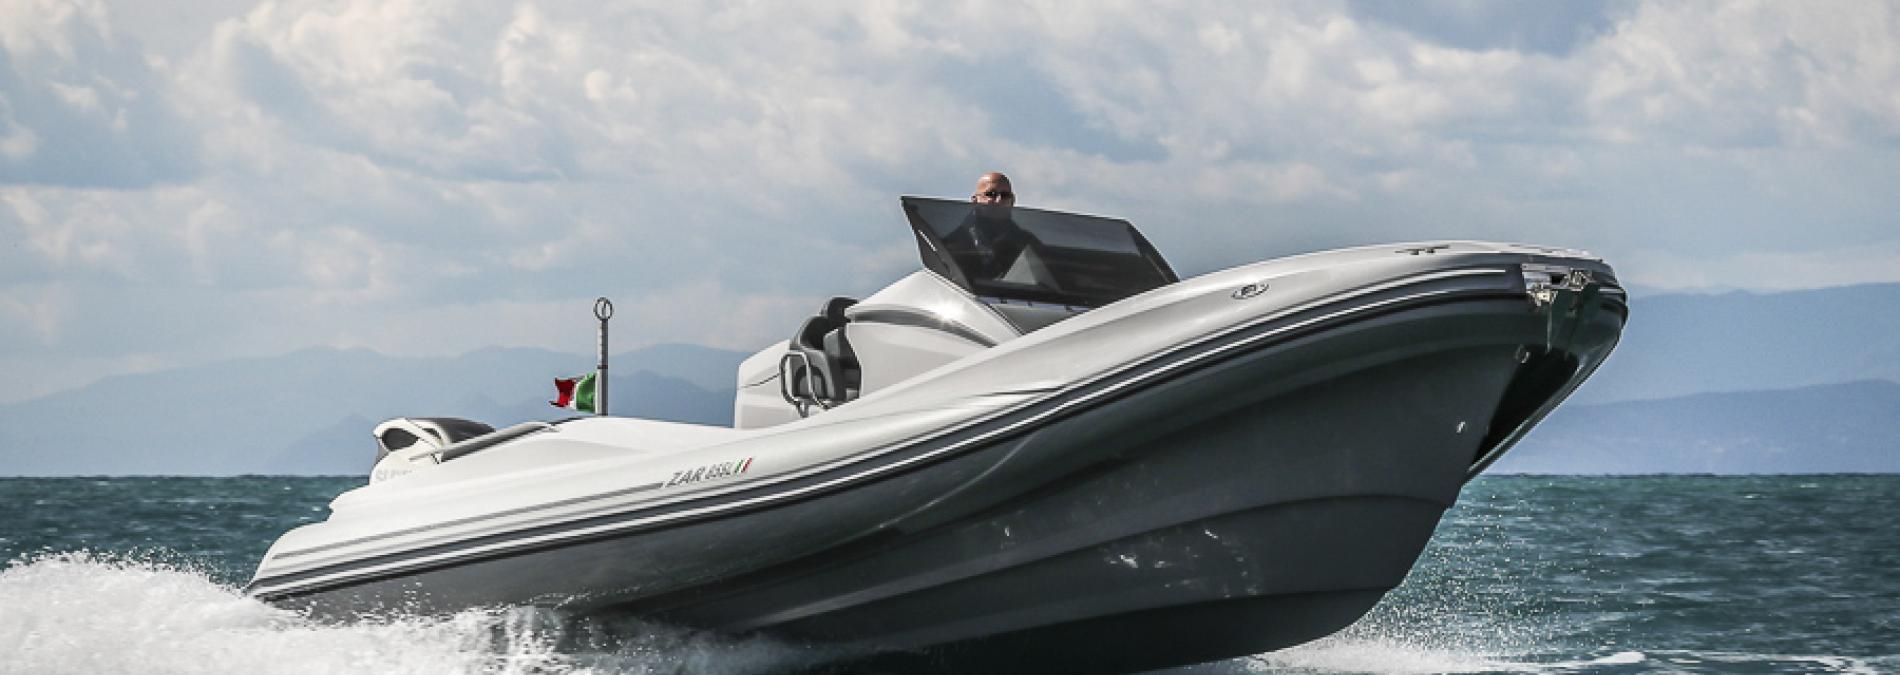 ZAR Formenti Cannes - Mandelieu - Antibes